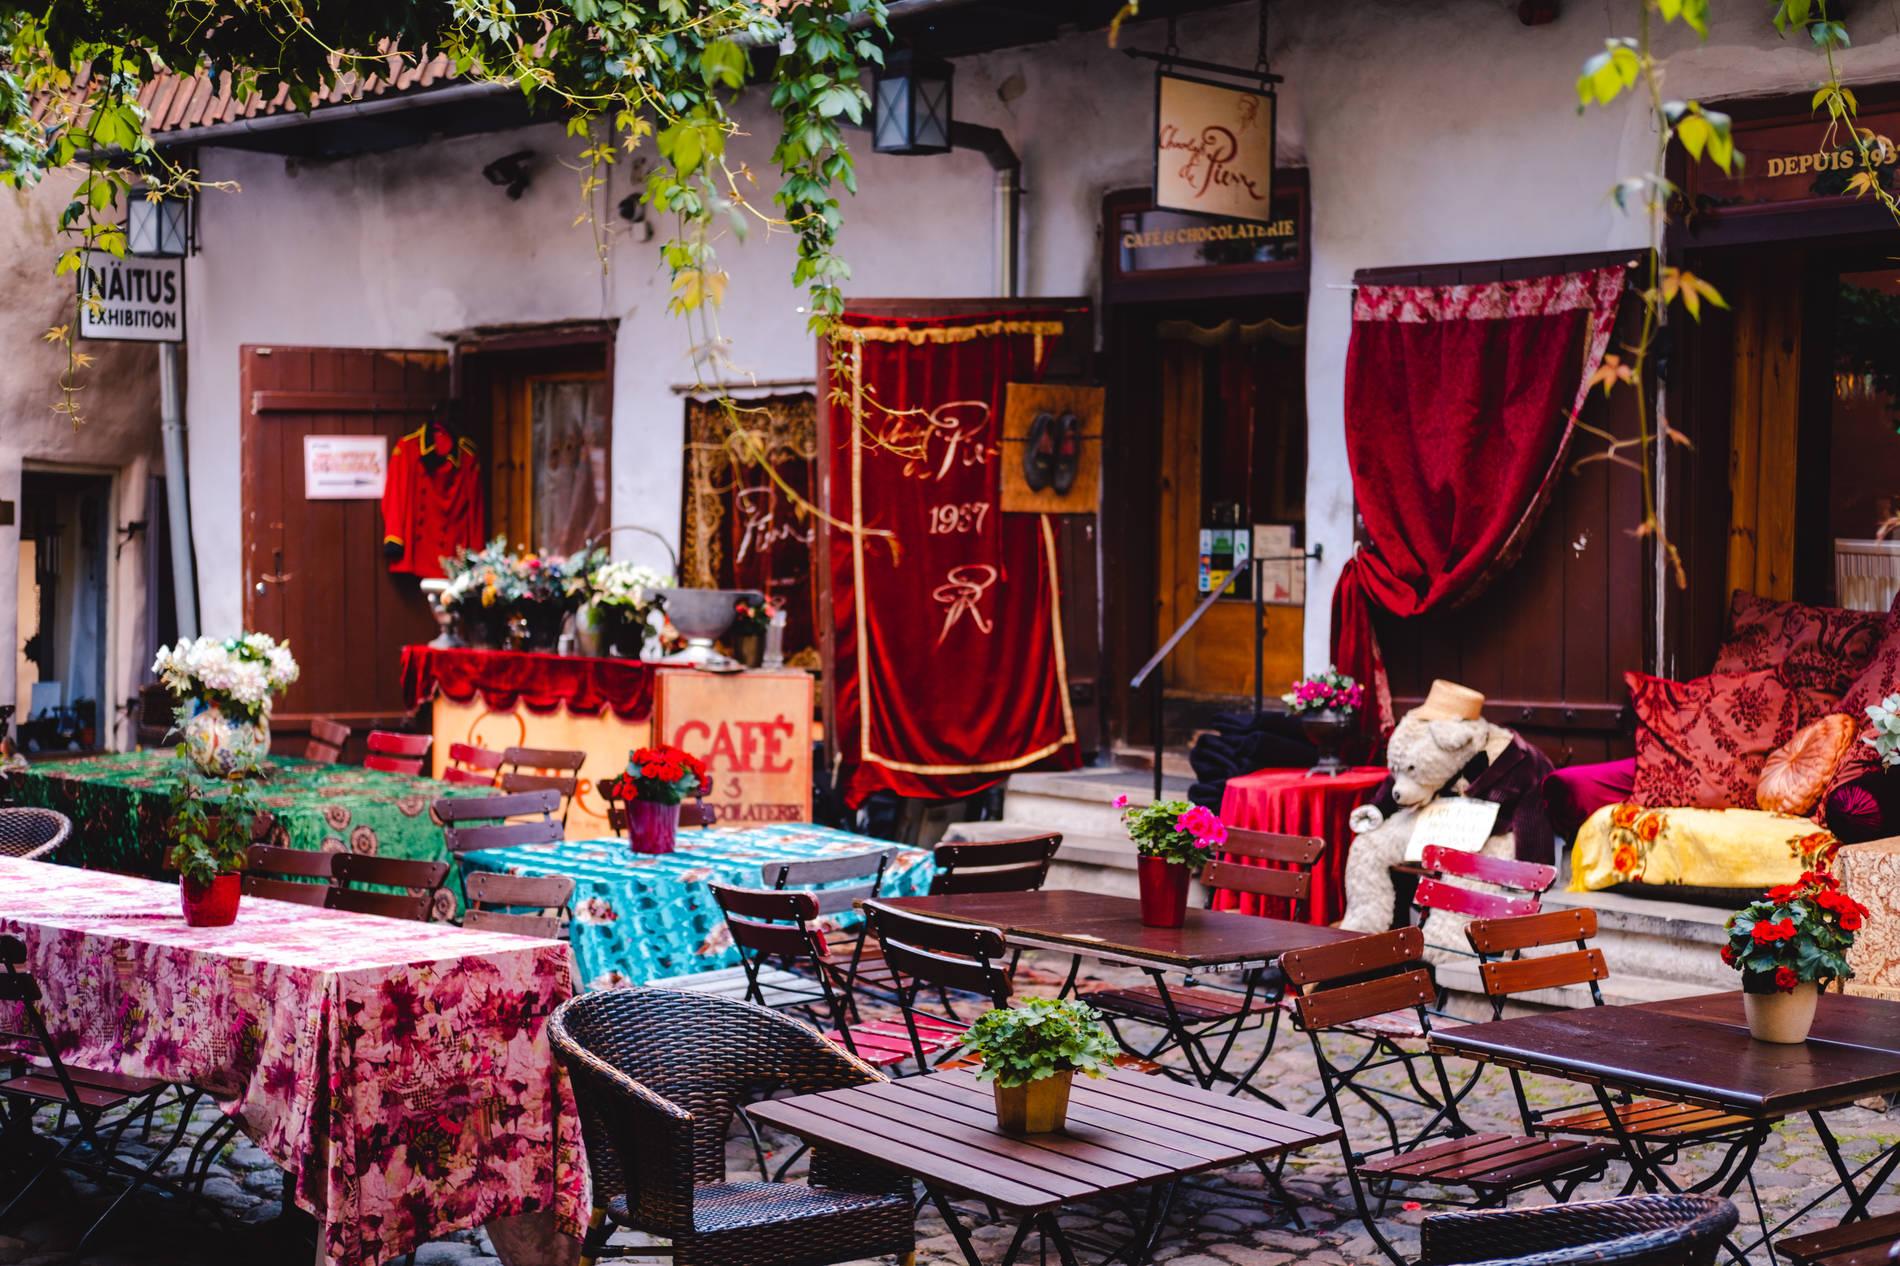 A café in the Master's Courtyard in Tallinn, Estonia